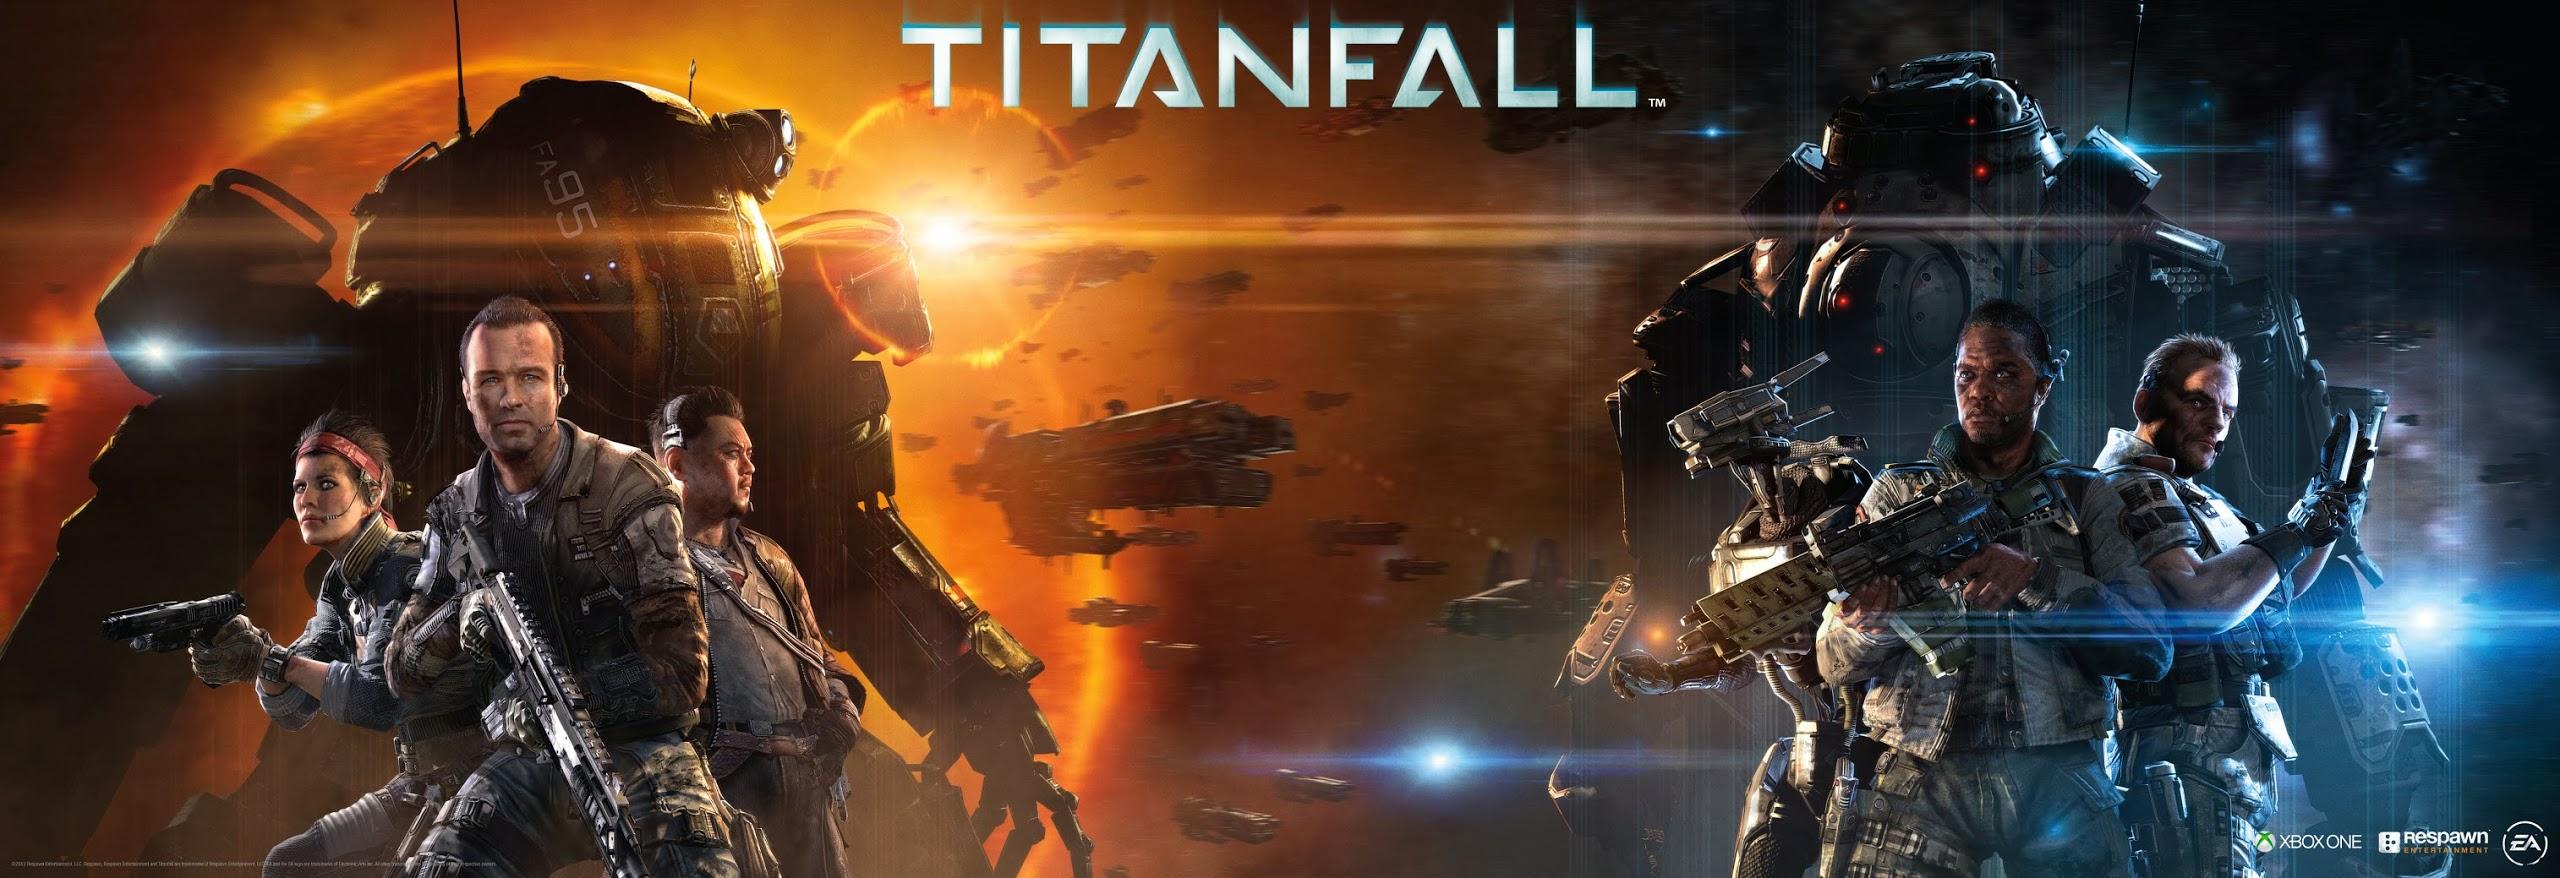 titanfall-poster